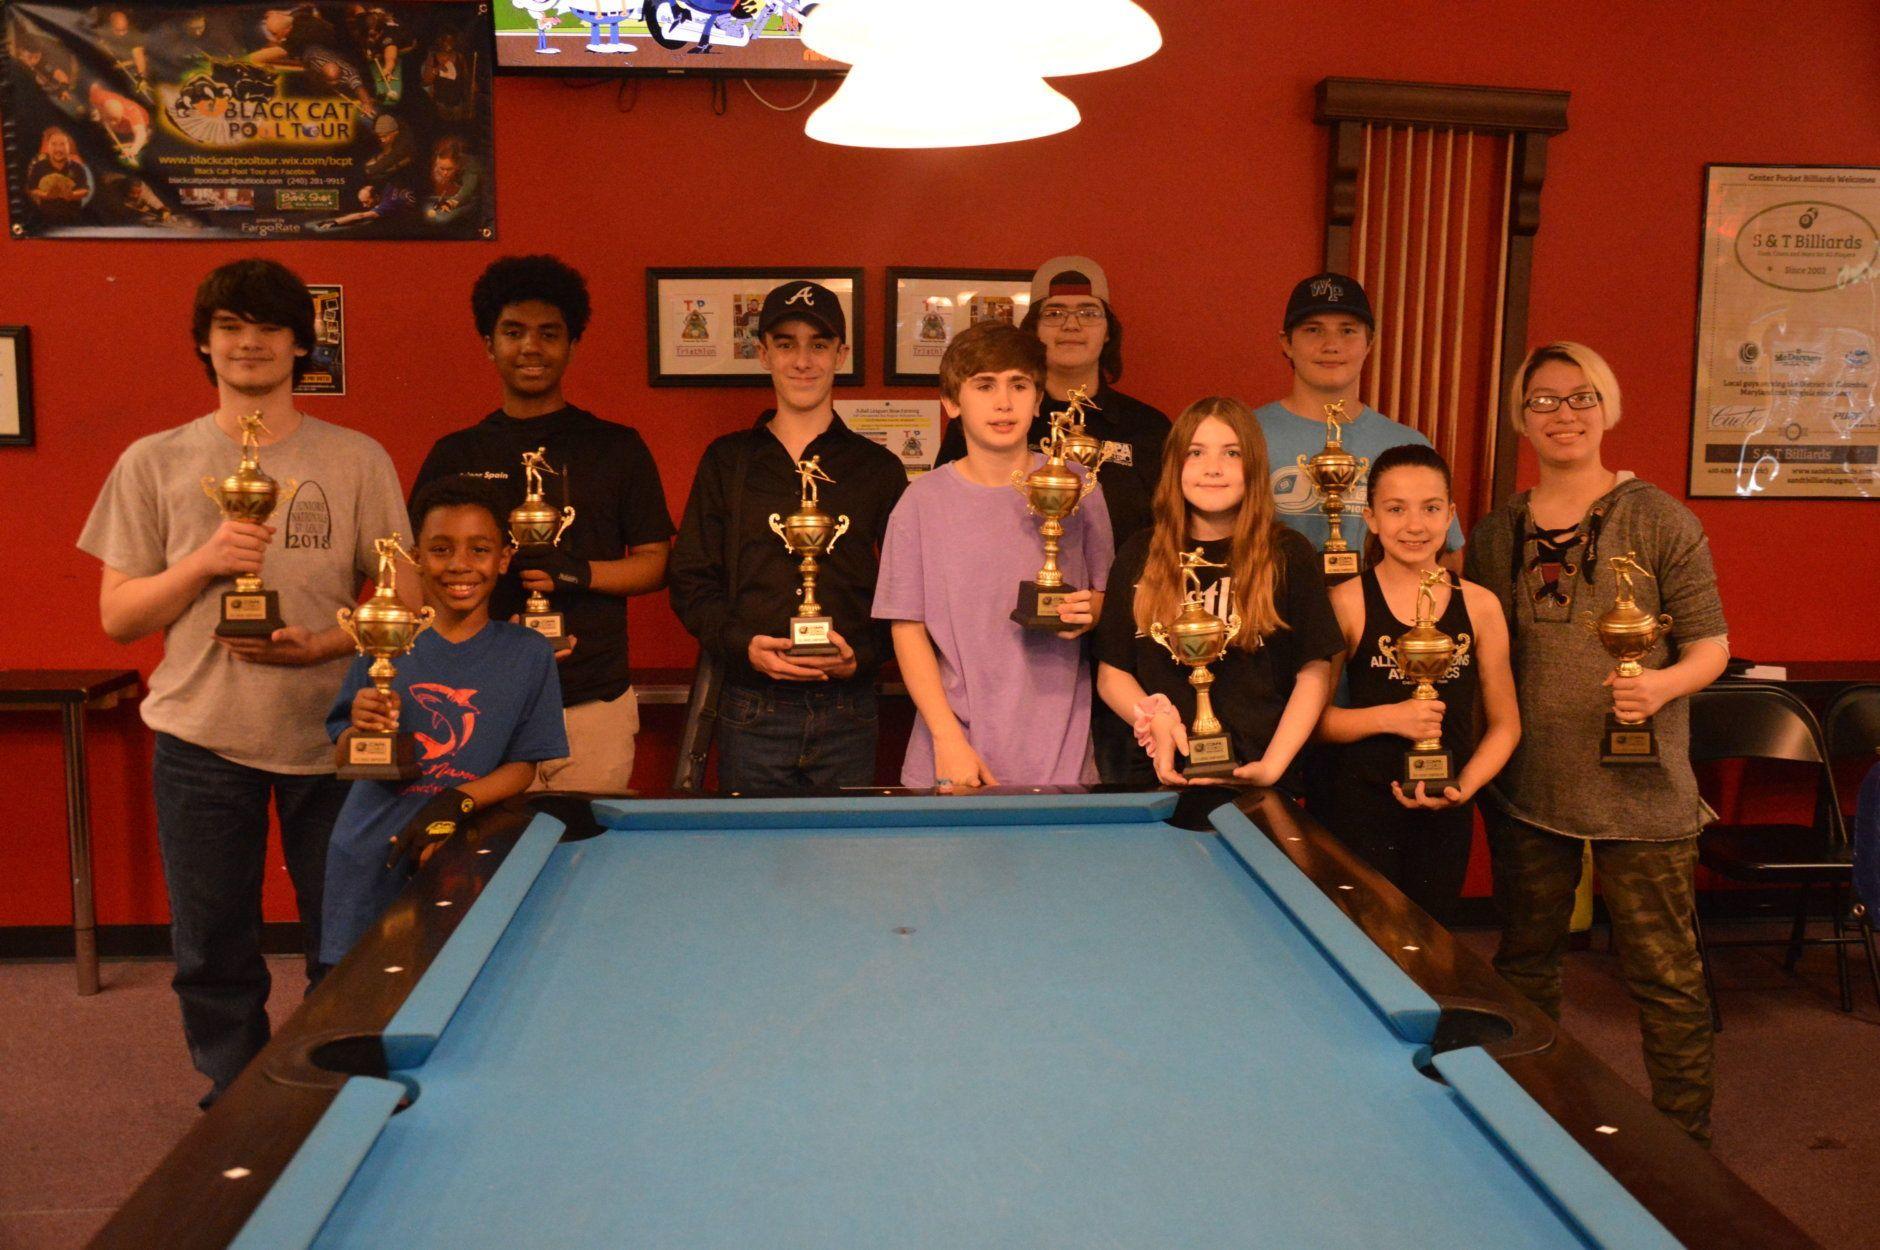 The 10 winners.  From left to right: Dalton Giffin, 17, Alexandria, VA, D'Angelo (Jawz) Spain, 8, Glen Burnie, MD, Frank (Sniper) Spain III, 16, Glen Burnie, MD, Jackson Strong, 13, Fairfax, VA, John Mack III, 13, Pasadena, MD, Braxton Ellison IV, 17, Newville, PA, Taylor Perkins, 11, Burke, VA, Collin McBain, 16, Alexandria, VA, Skylar Hess, 10, Bowie, MD, Victoria (Jana) Mitchell, 17, Springfield, VA. (Courtesy Greater D.C. Area APA)